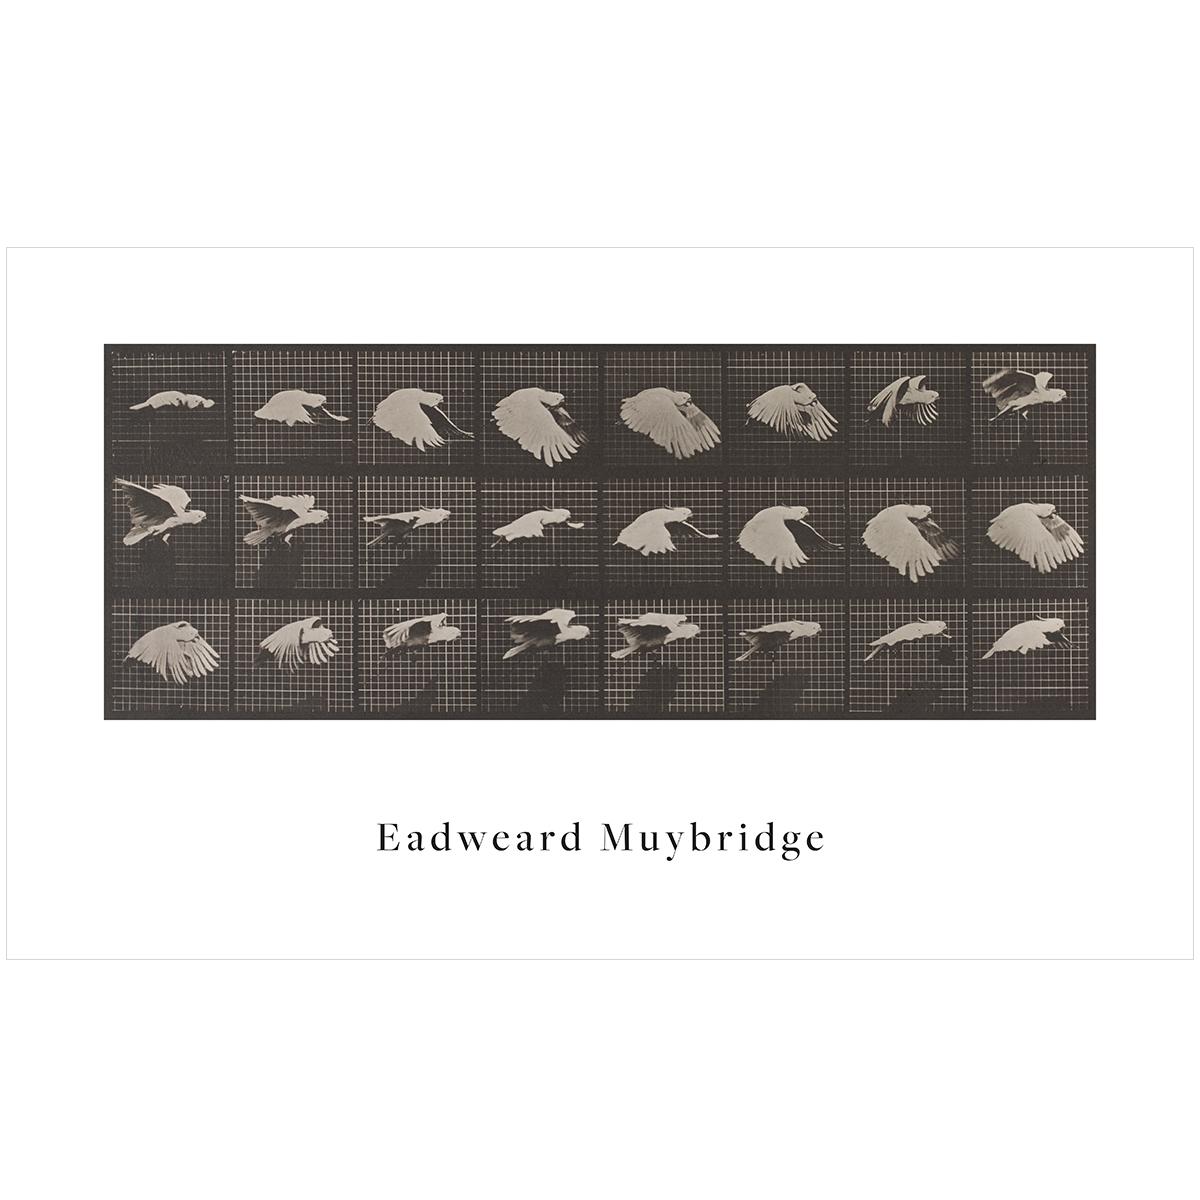 V&A Eadweard Muybridge print